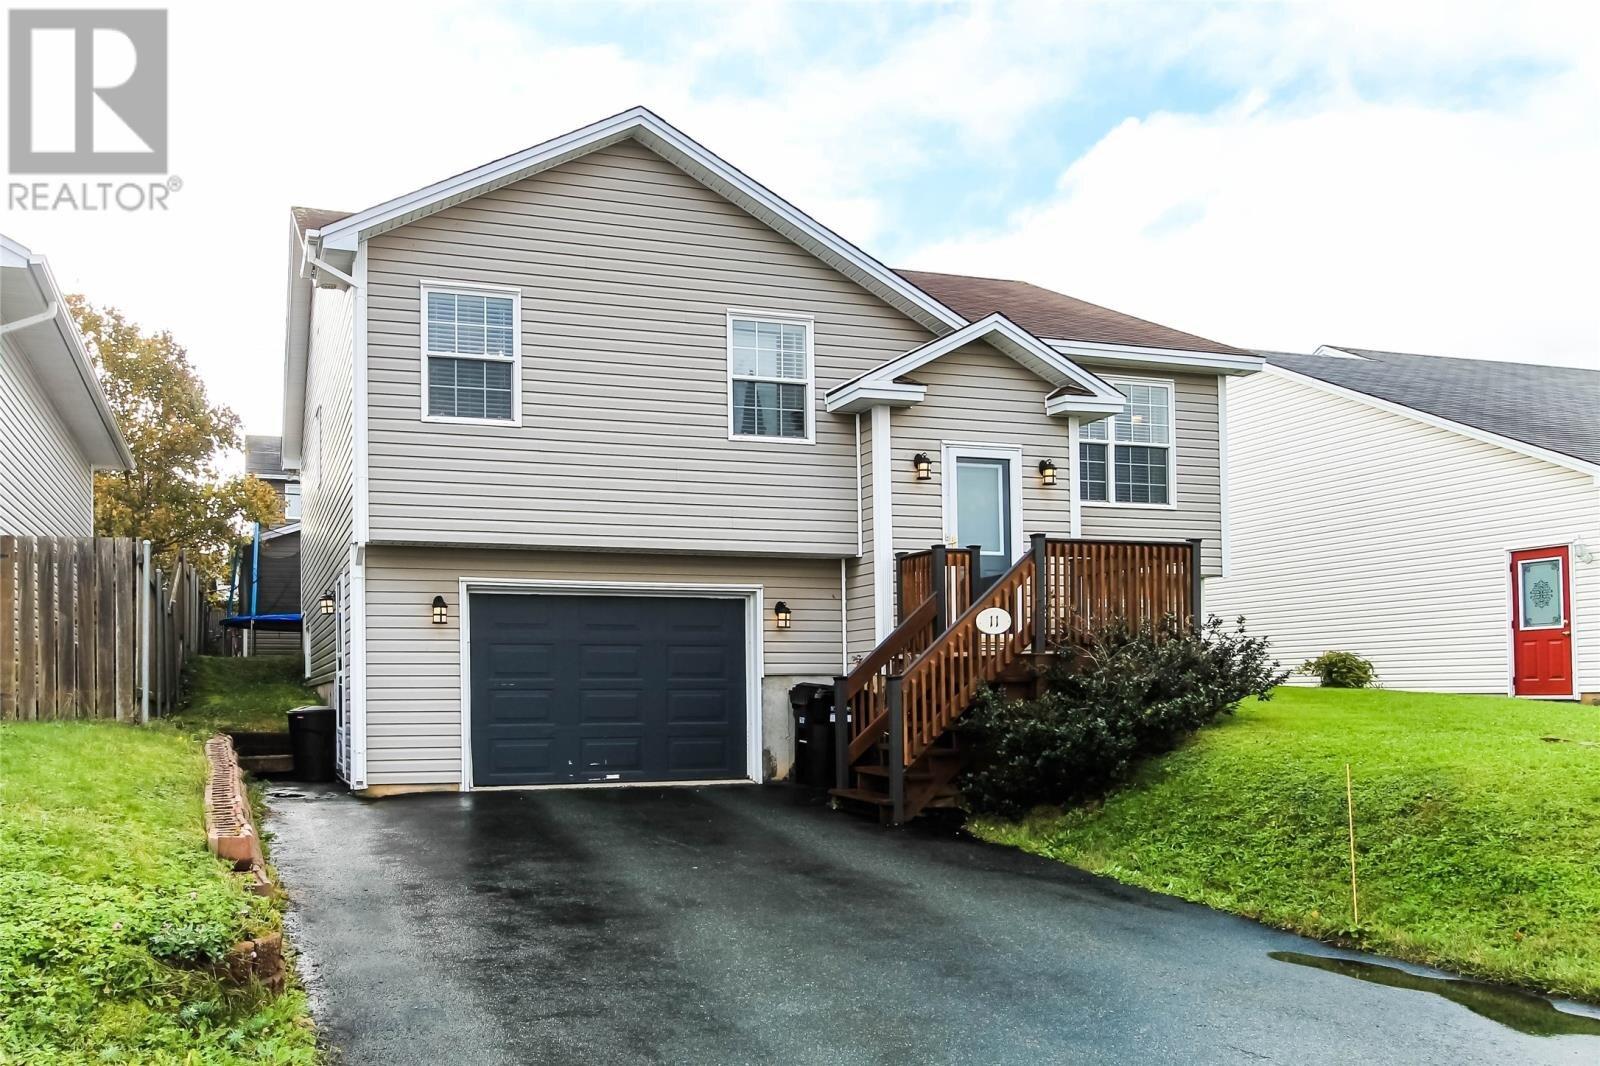 House for sale at 11 Lancaster St St. John's Newfoundland - MLS: 1222811